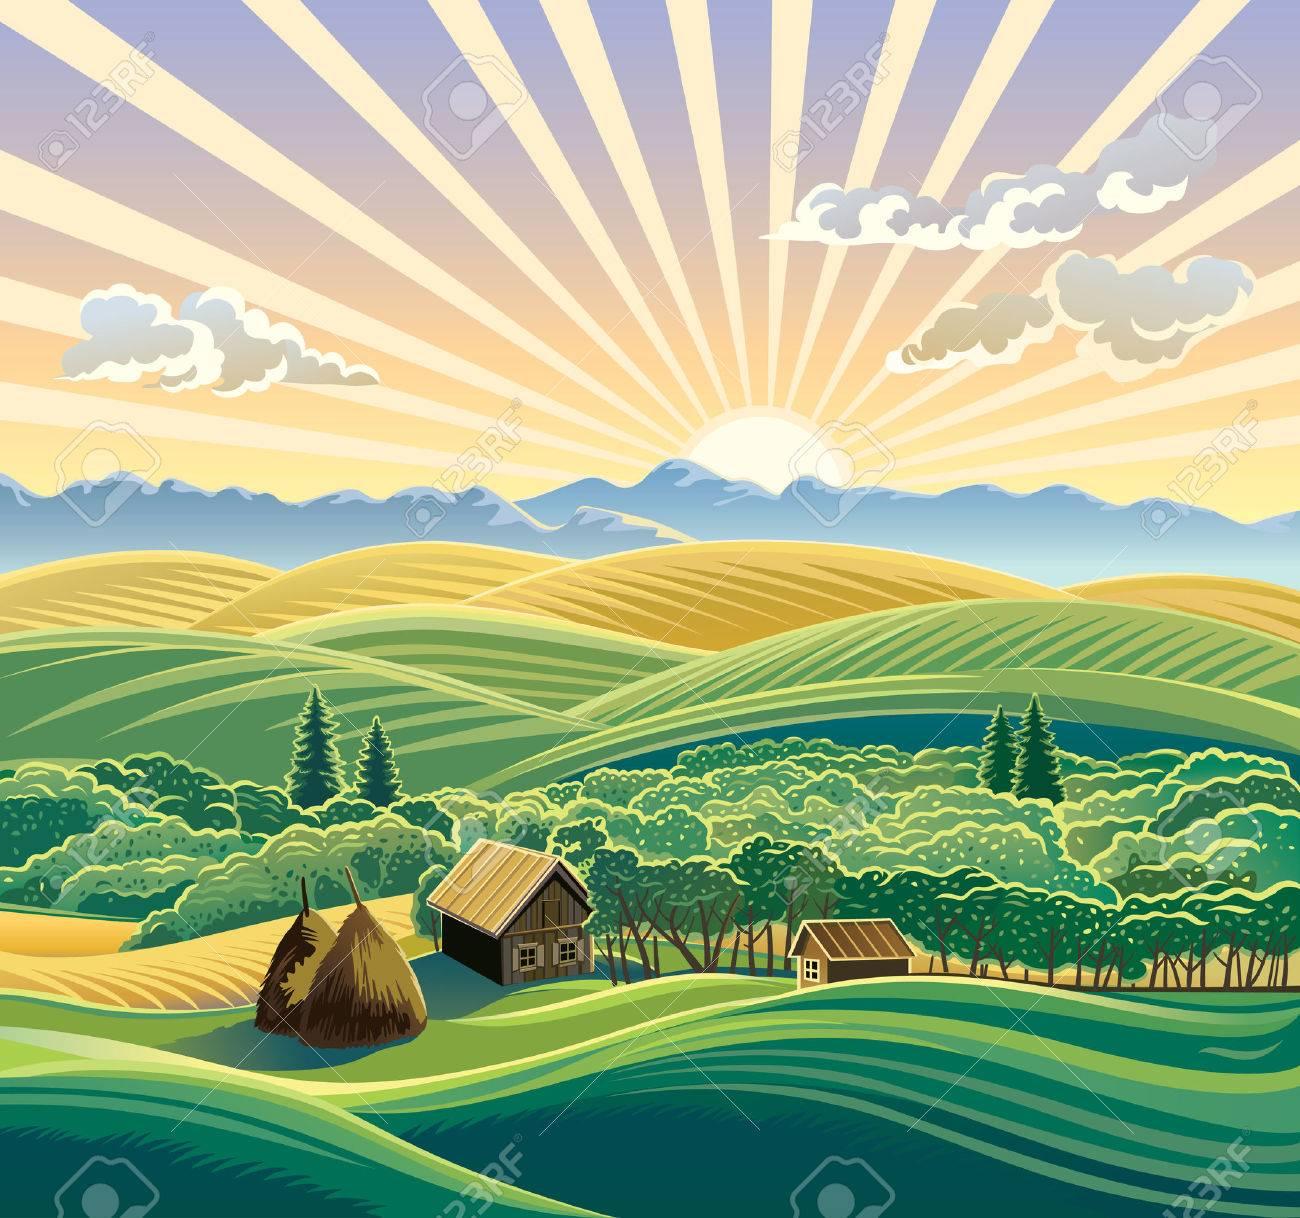 Rural landscape with a hut. - 48656060